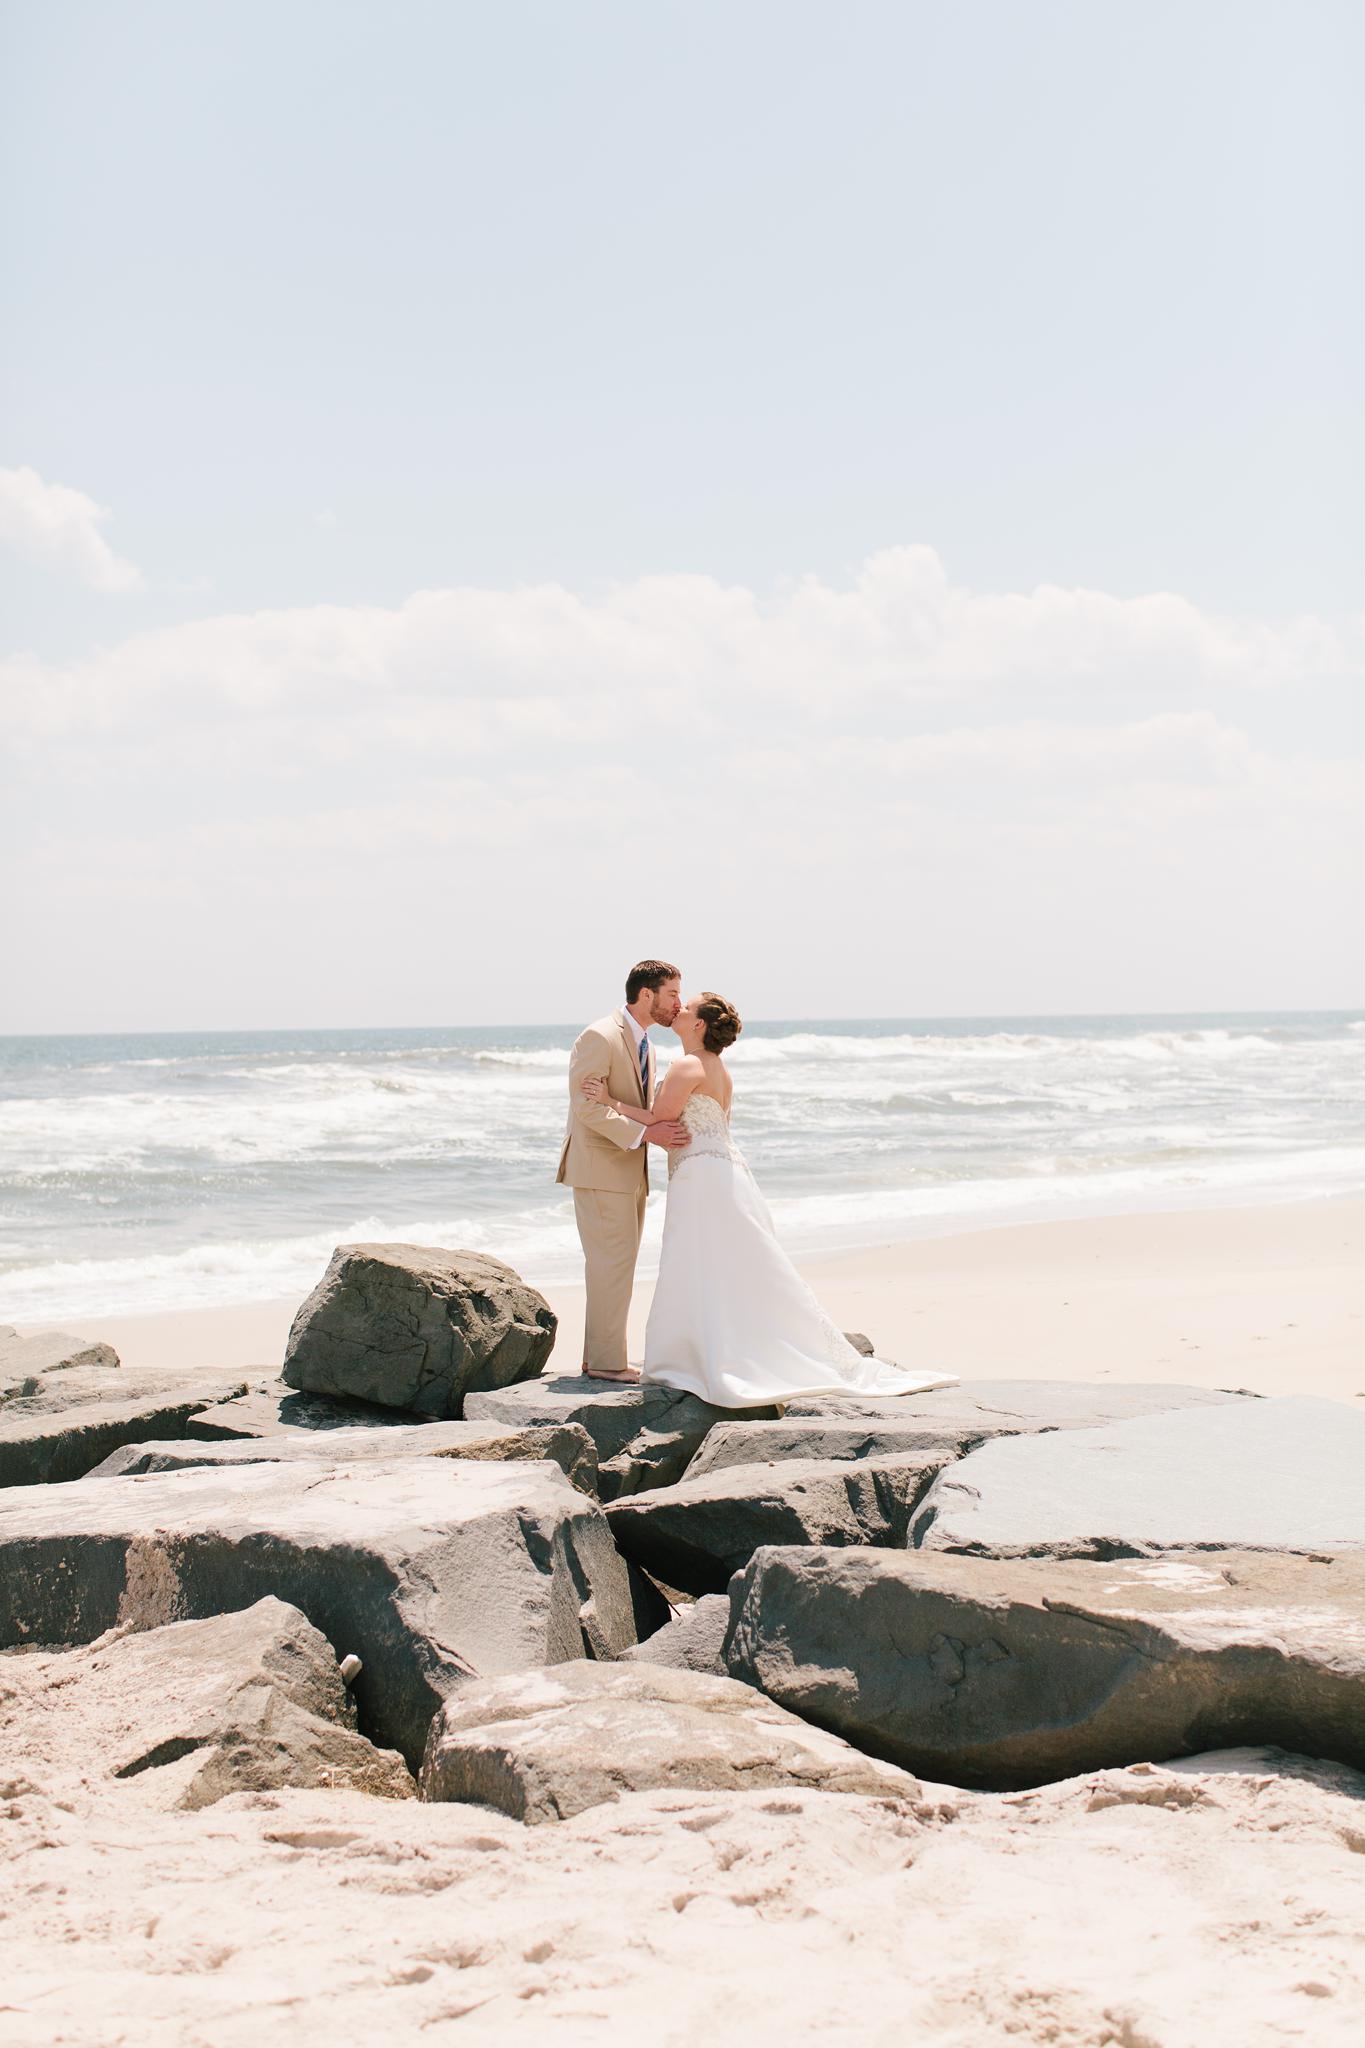 brant_beach_yacht_club_wedding_long_beach_island_nj_wedding_photographer_87.jpg